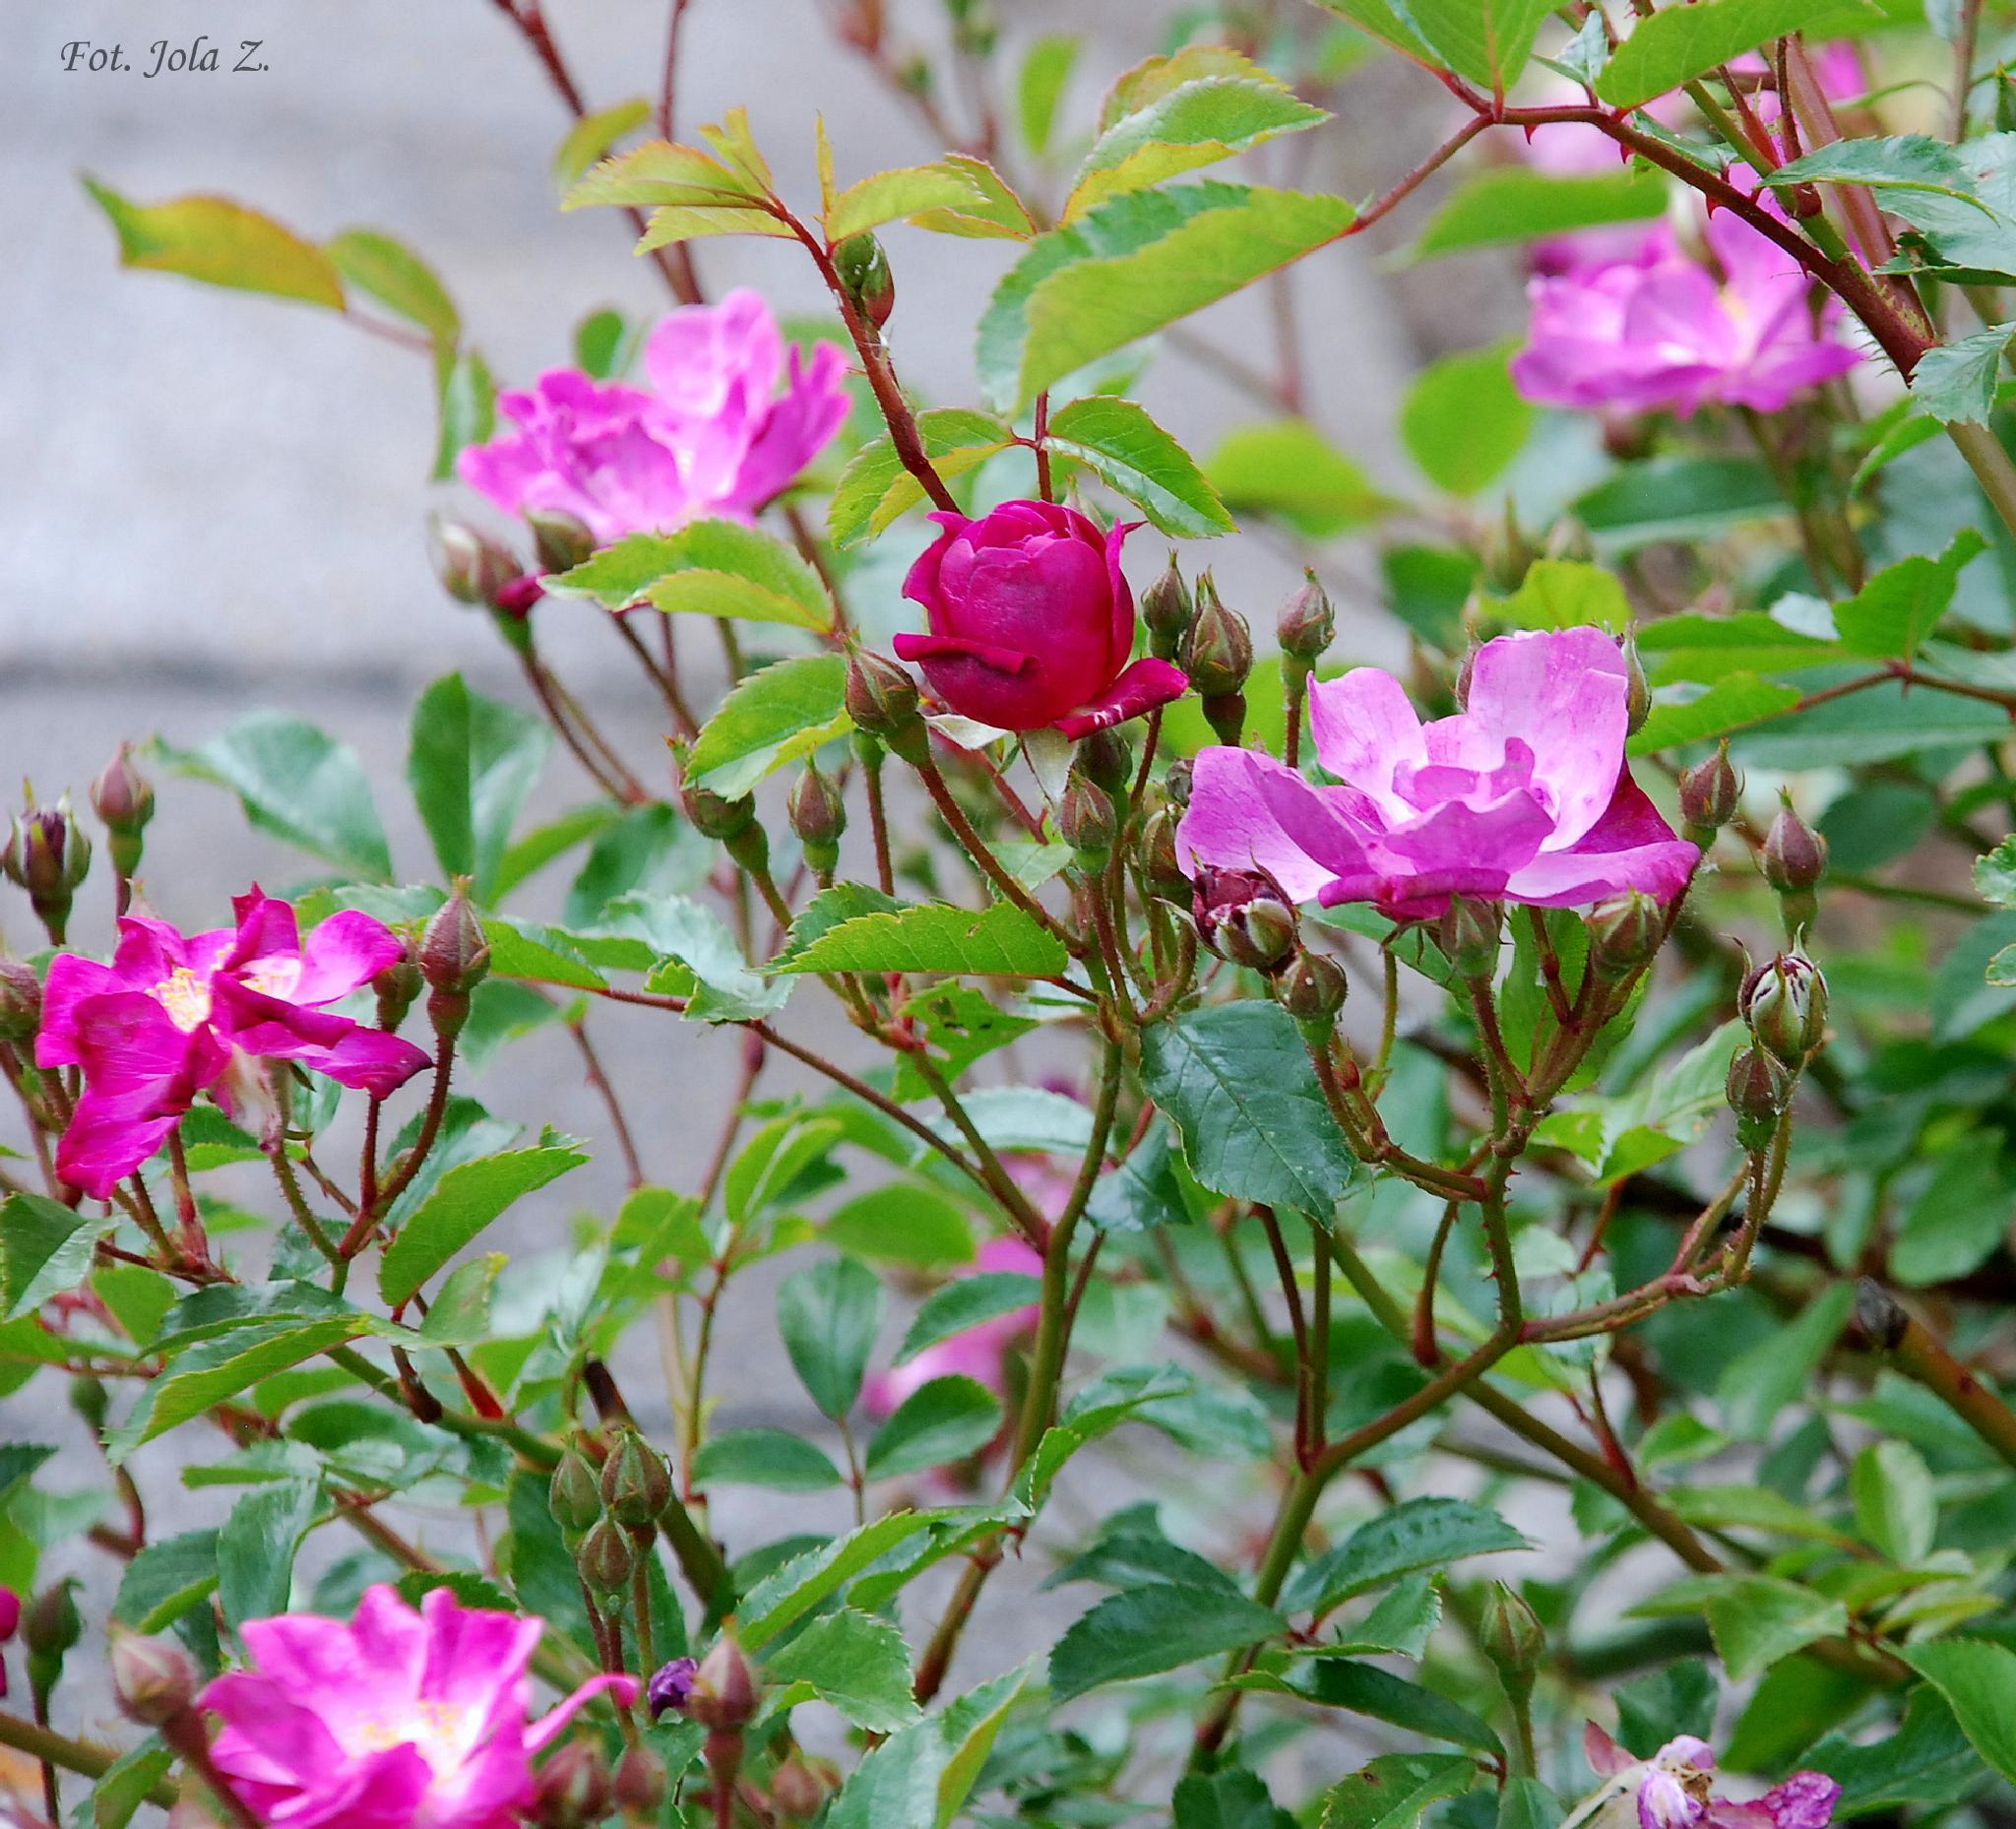 Roses by jolanta.zuzel